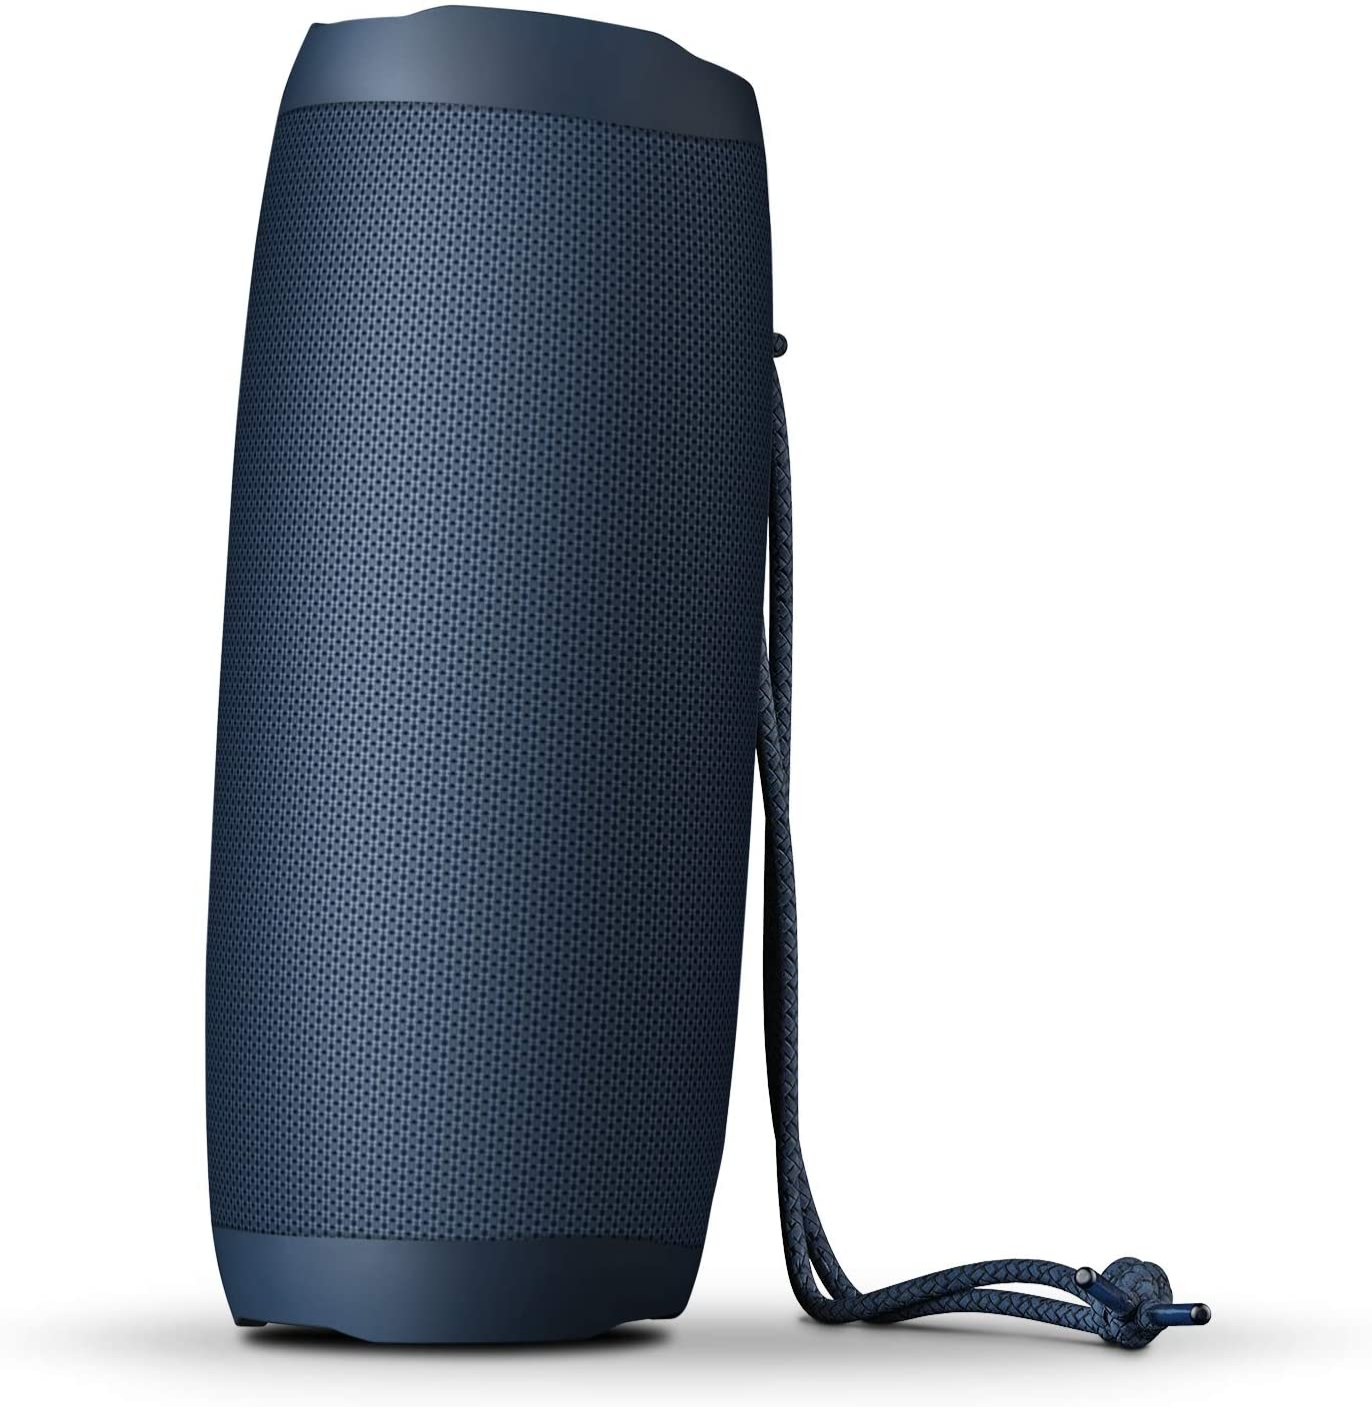 Energy Sistem Speaker FS3 Altavoz portátil con Bluetooth y Tecnología True Wireless (20 W, True Wireless Stereo, Bluetooth 5.0, USB/microSD MP3 Player)